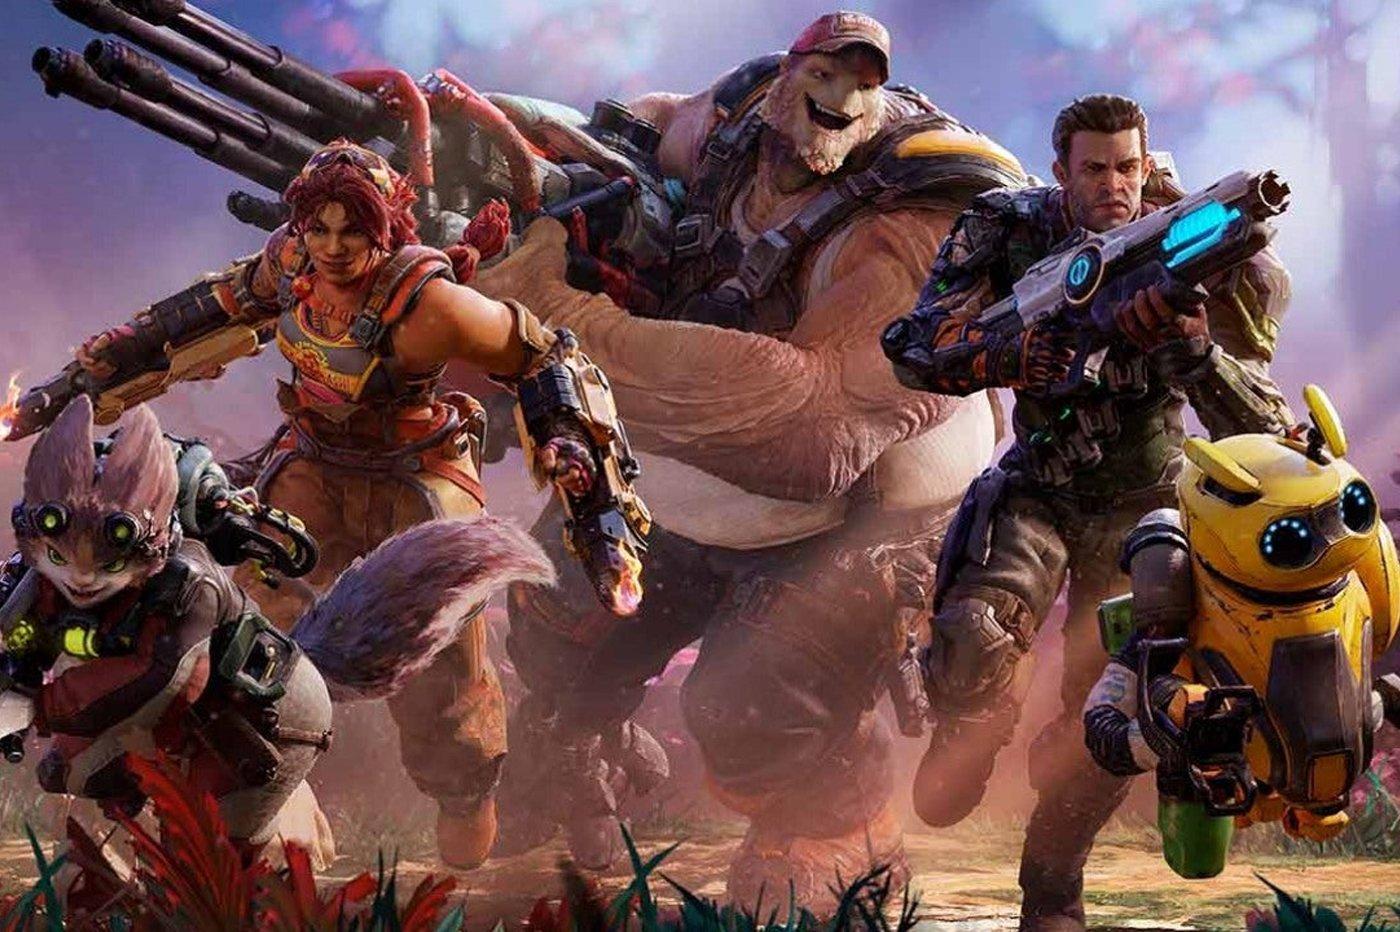 Lancé en mai. le jeu vidéo Crucible d'Amazon fermera ses portes en novembre